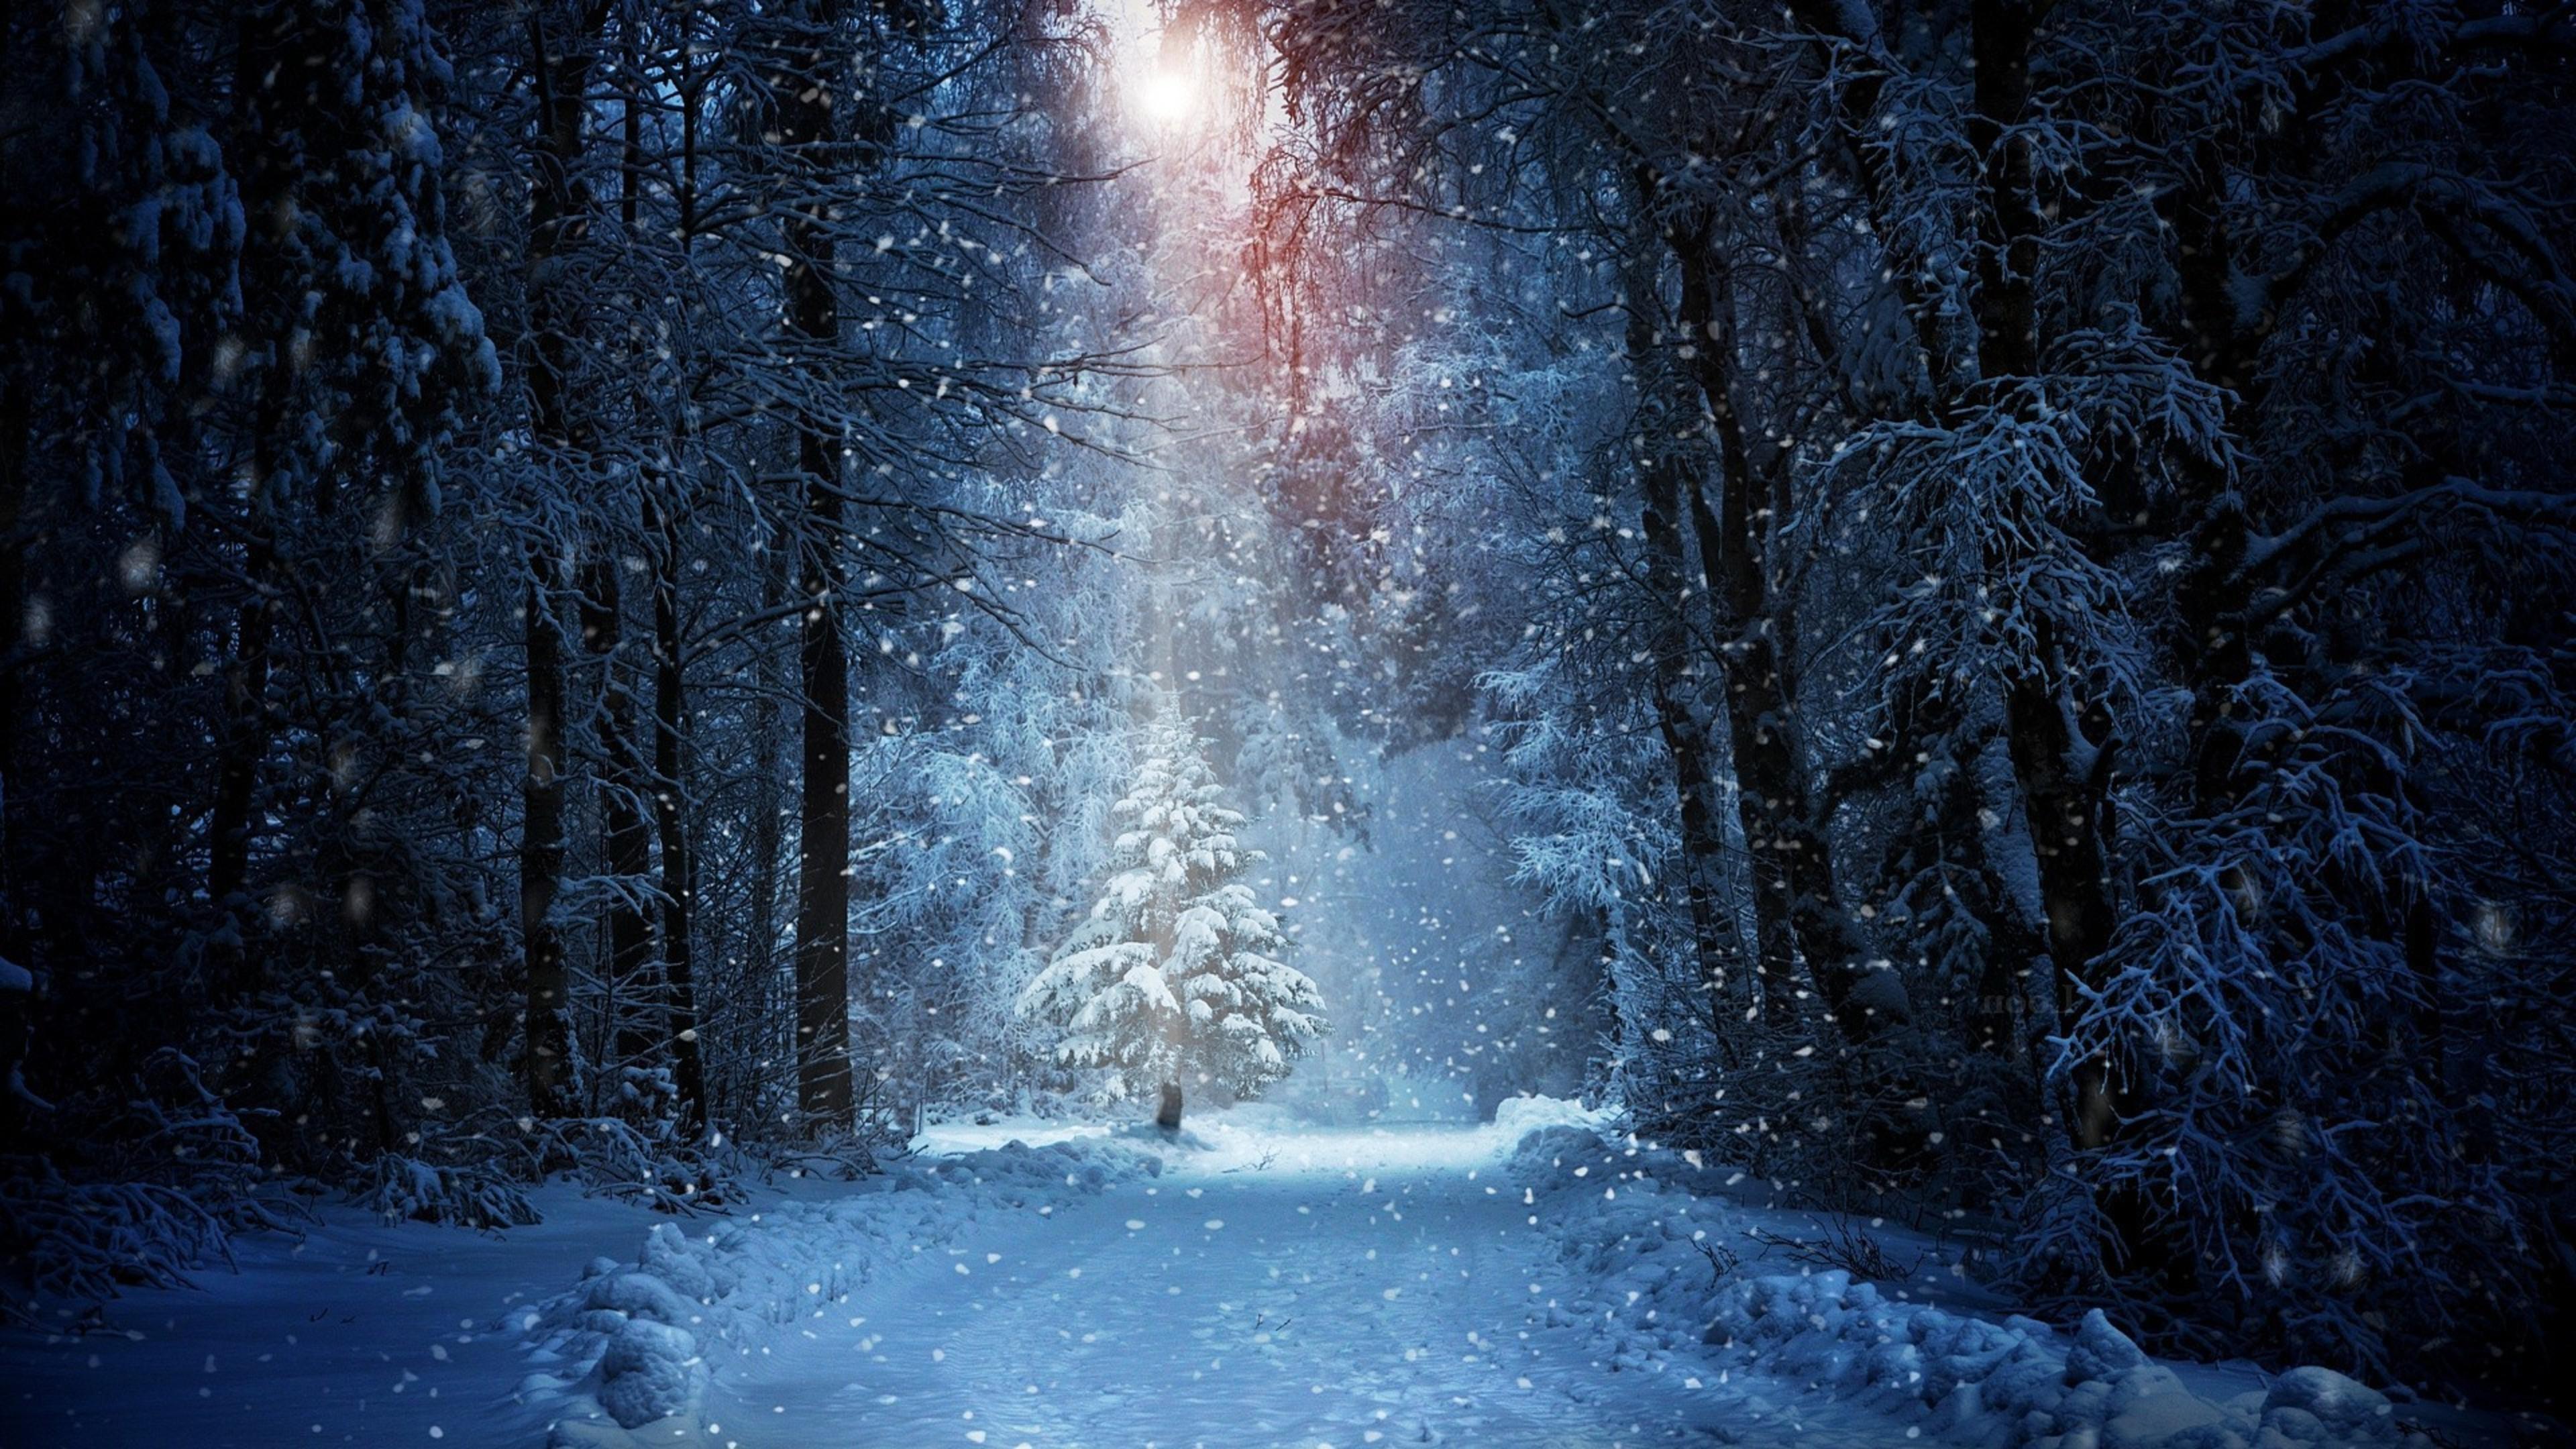 forest winter snow 4k 1540131543 - Forest Winter Snow 4k - winter wallpapers, snow wallpapers, nature wallpapers, forest wallpapers